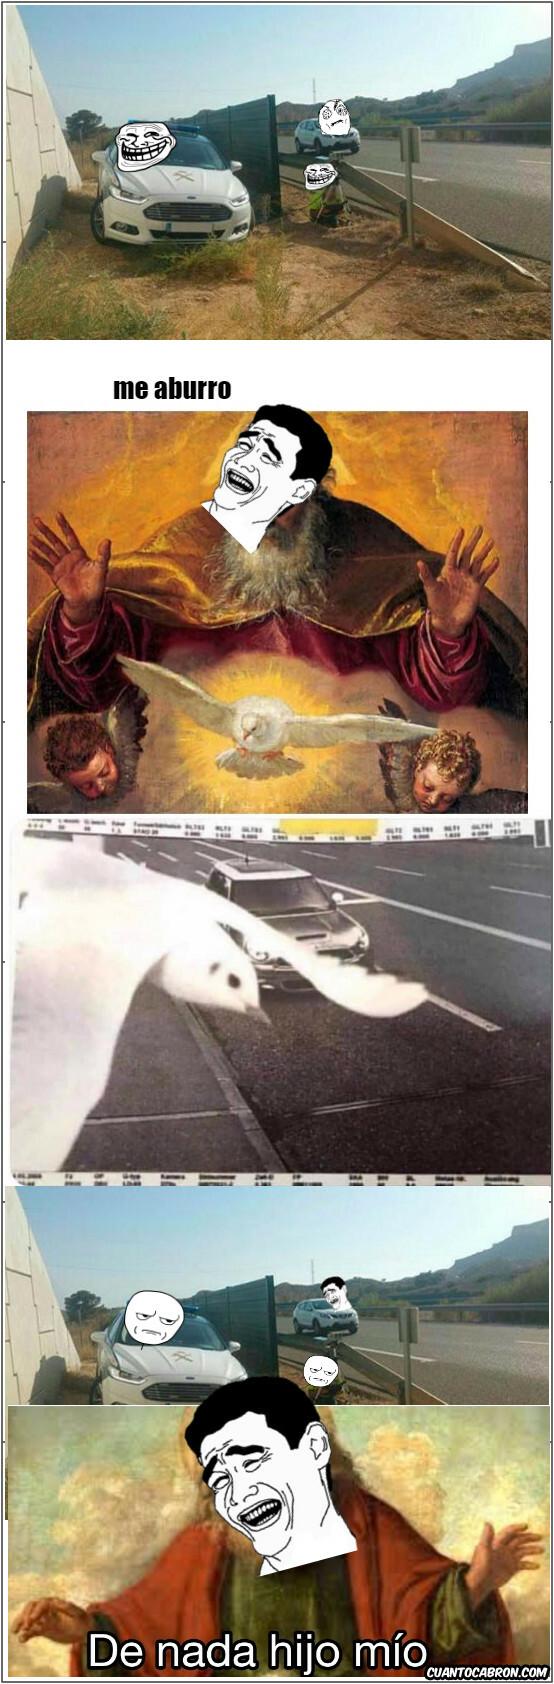 Yao - Yao ming es Dios